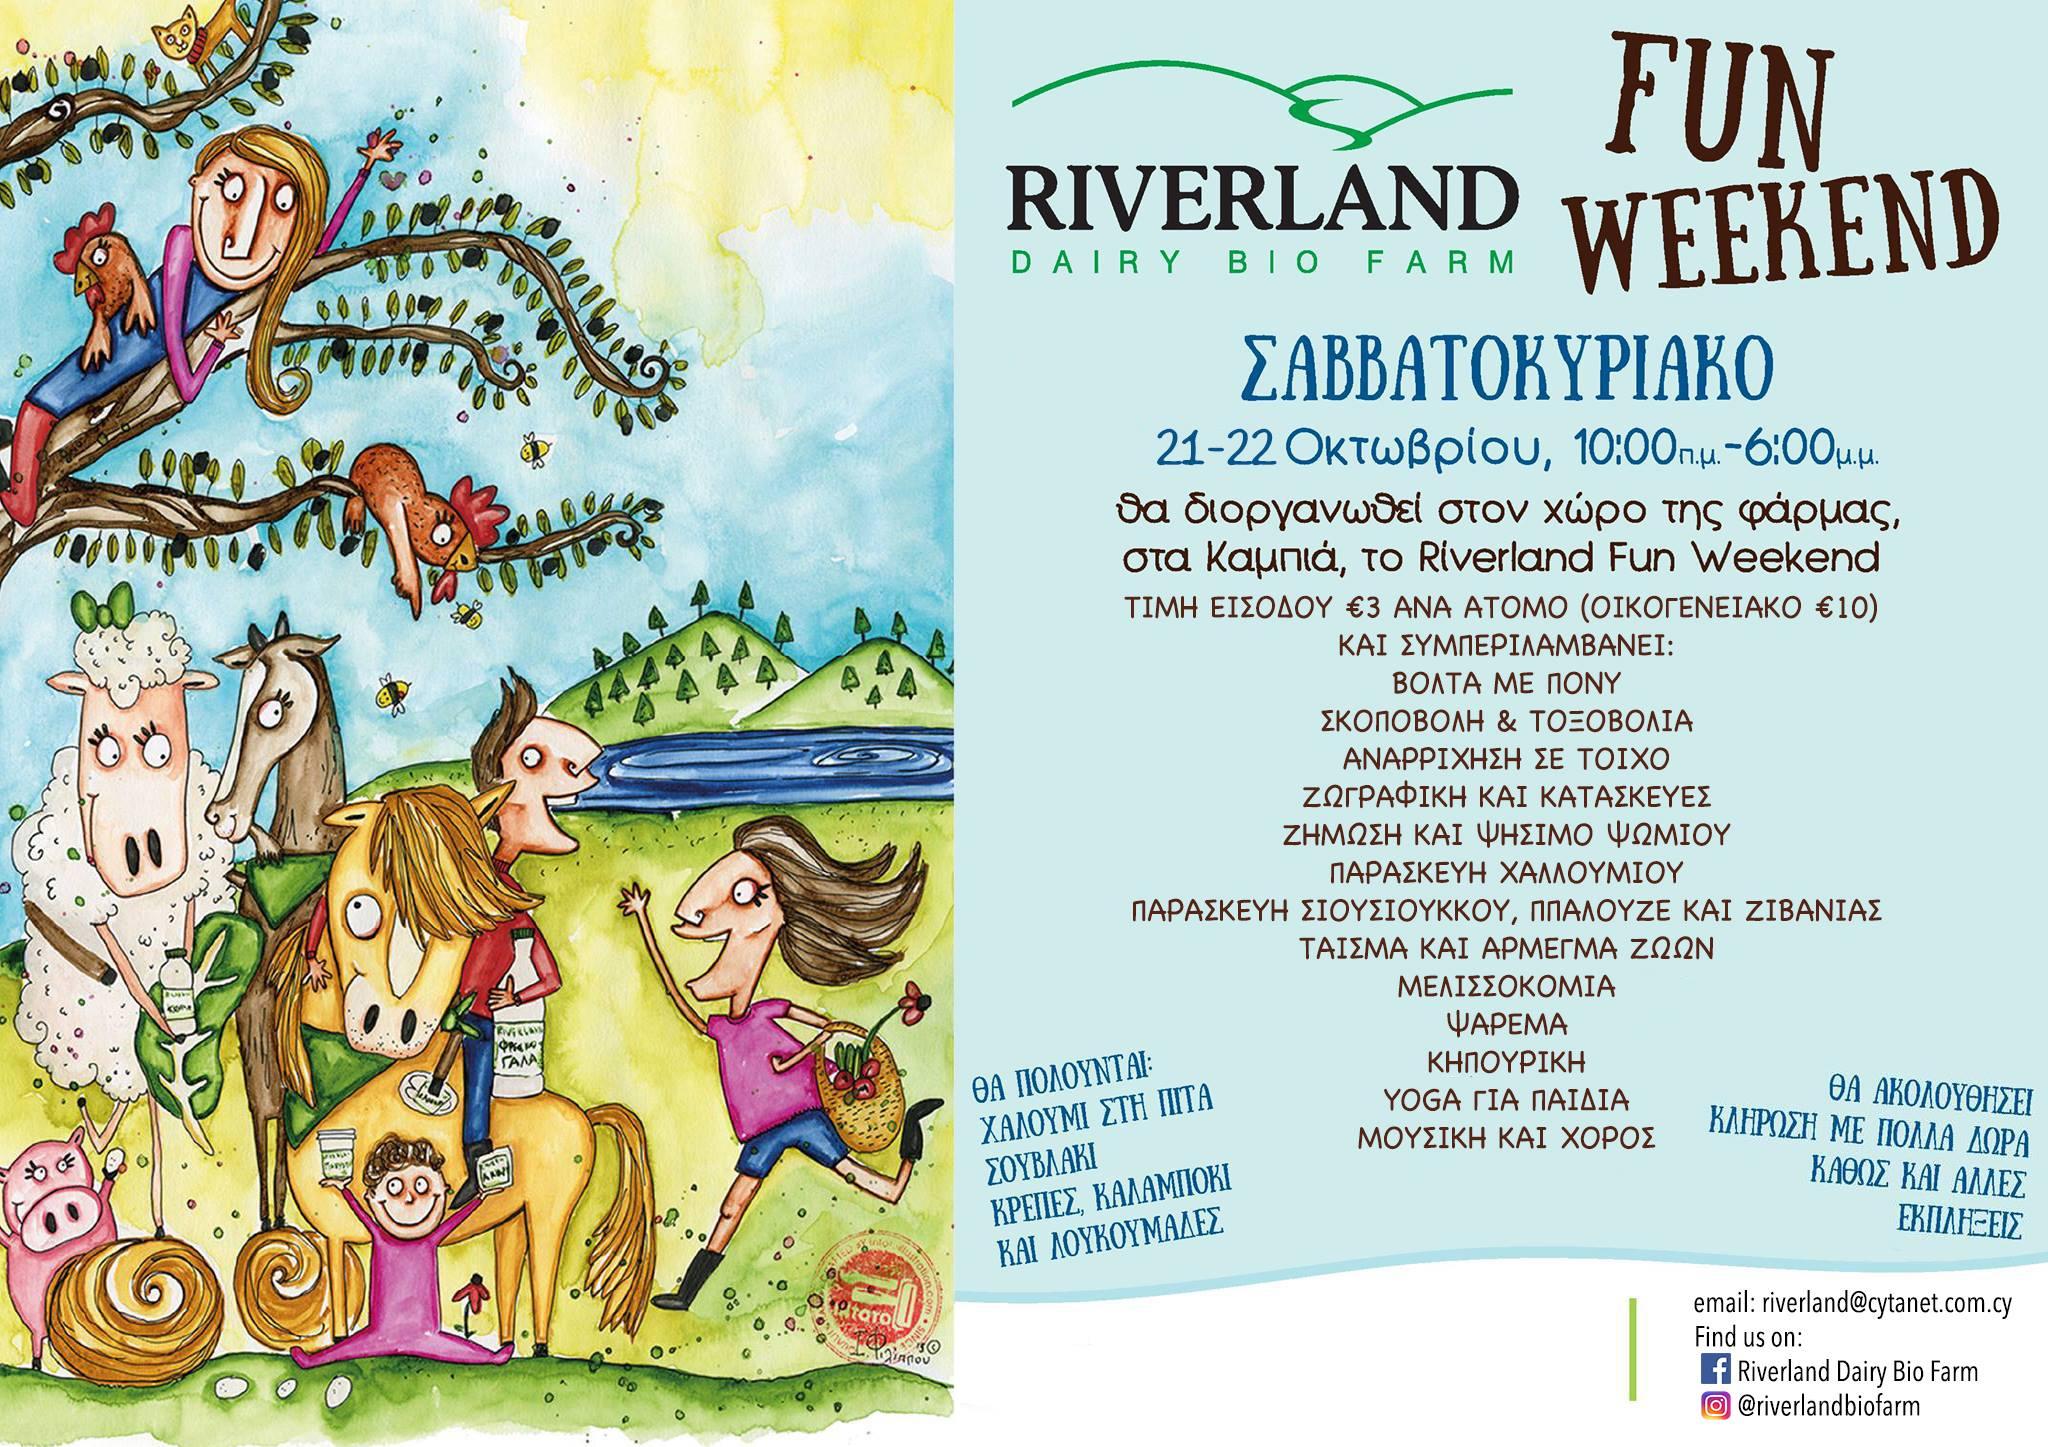 Fun Weekend @Riverland